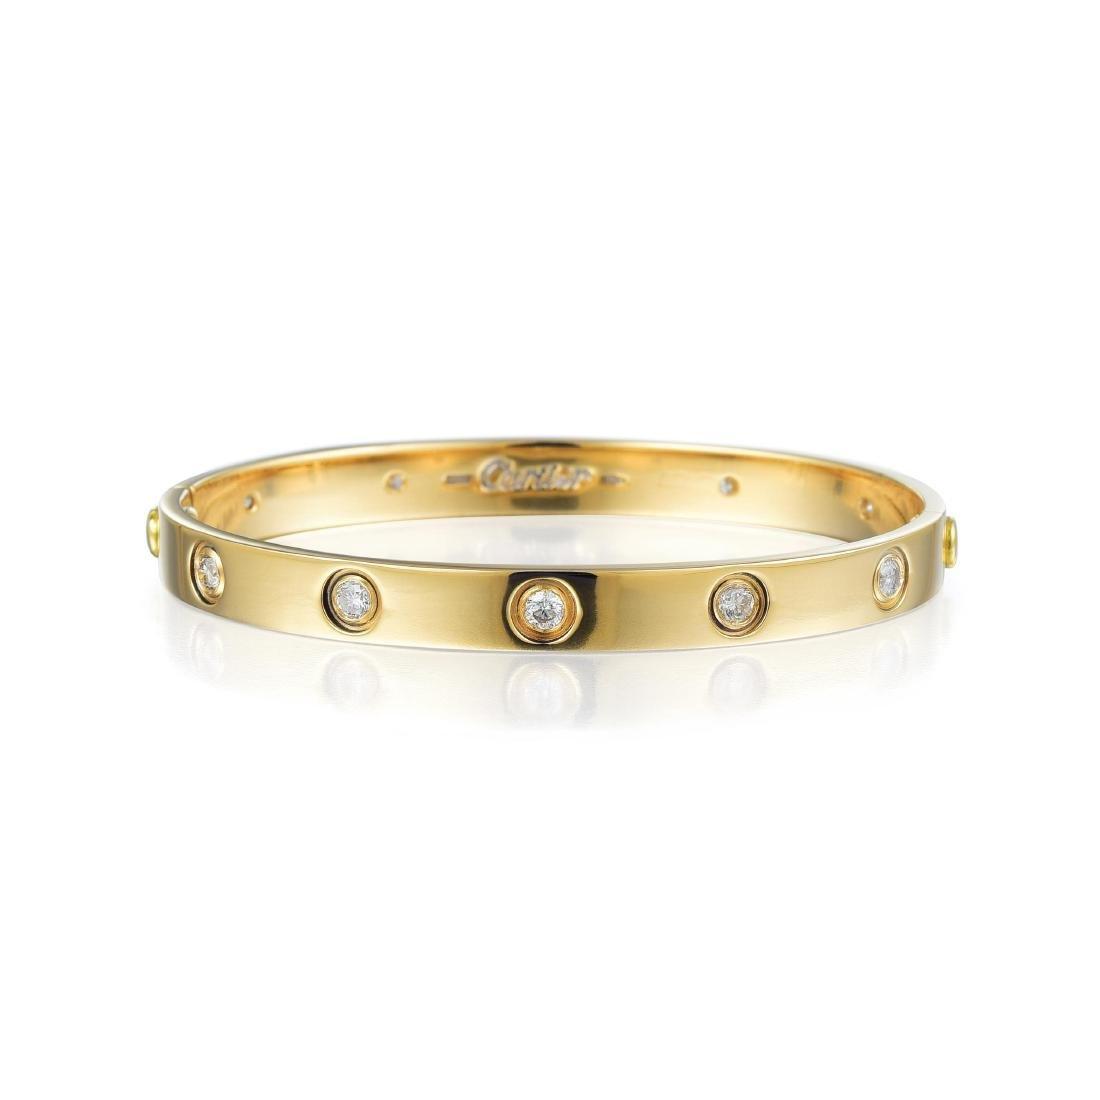 Cartier Diamond and Gold Love Bangle